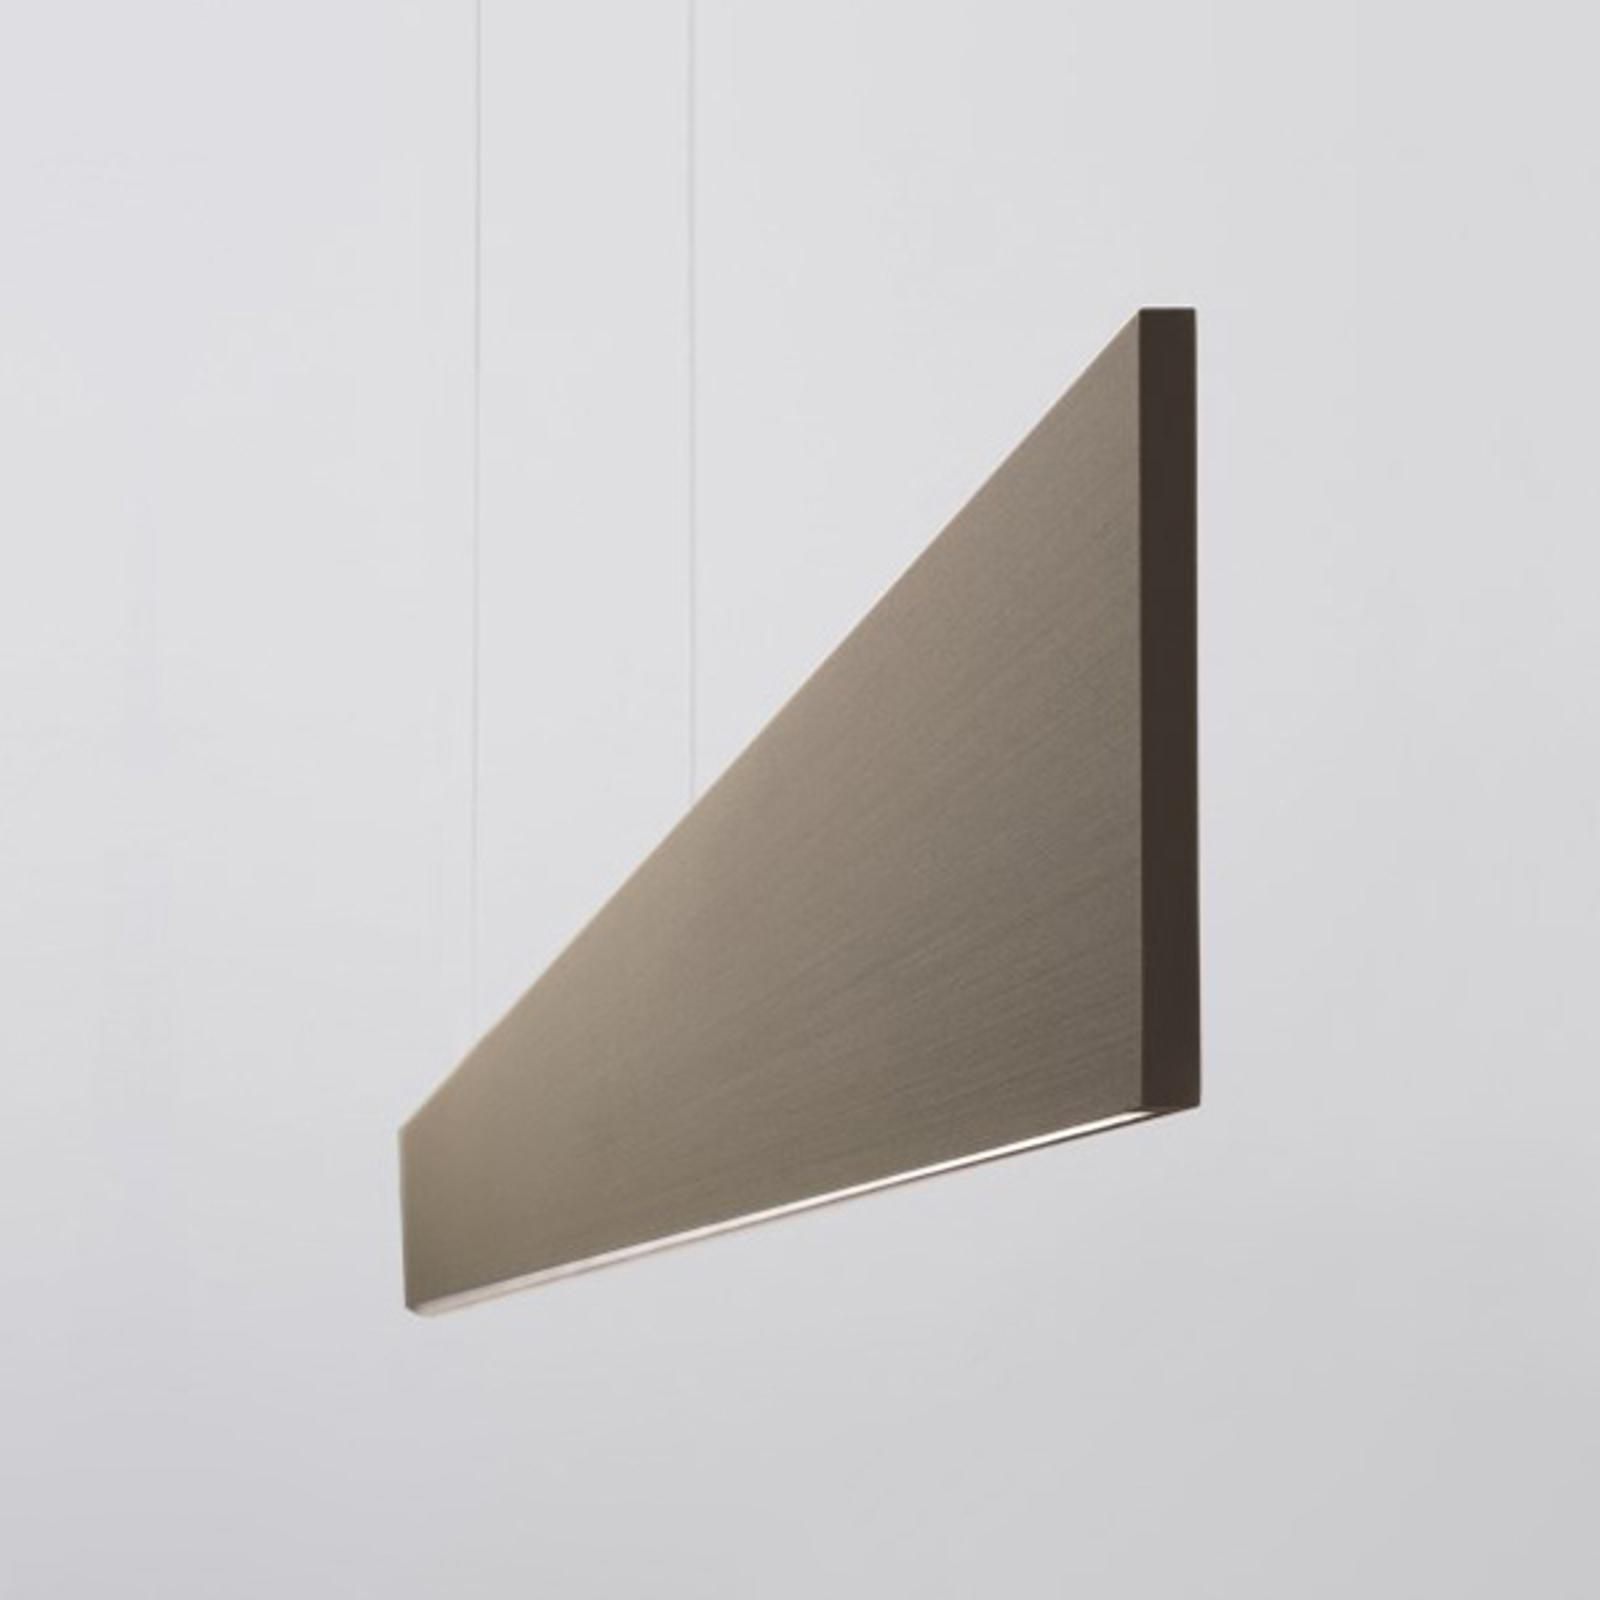 LED-Hängeleuchte After 8 122cm DALI 3.000K bronze